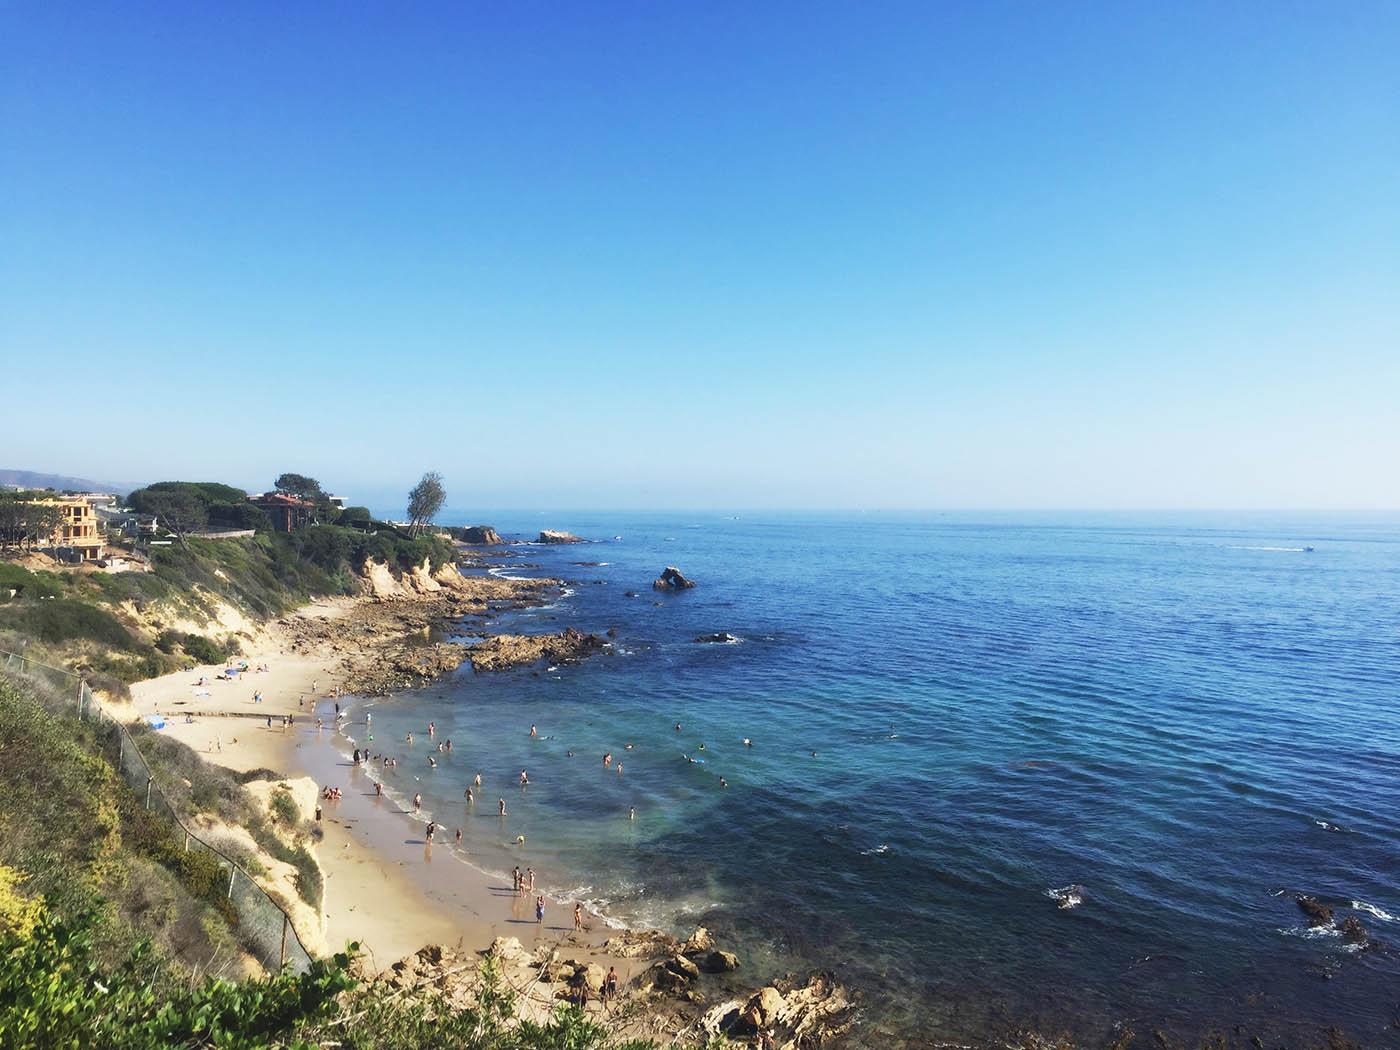 Tide pools at Little Corona Del Mar in southern California